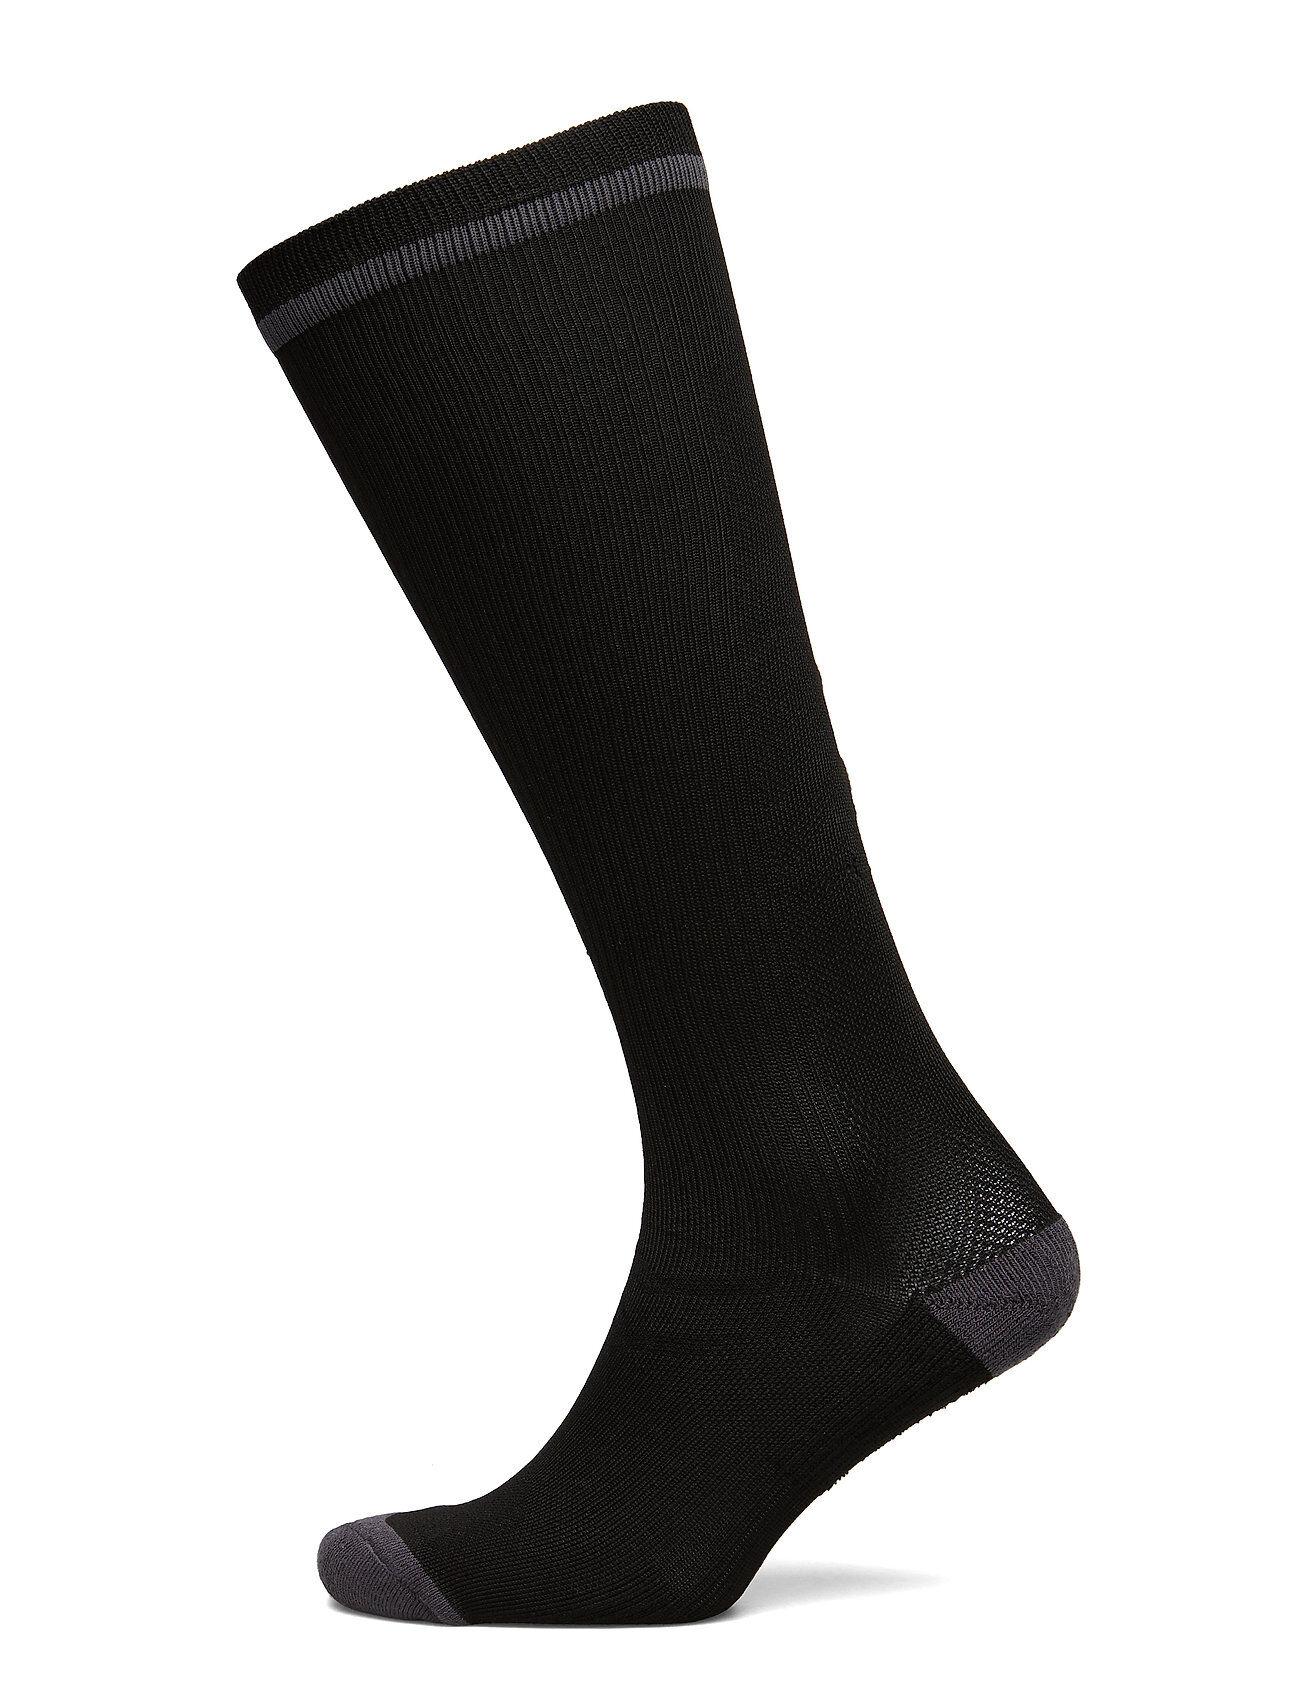 Hummel Elite Indoor Sock High Underwear Socks Football Socks Svart Hummel